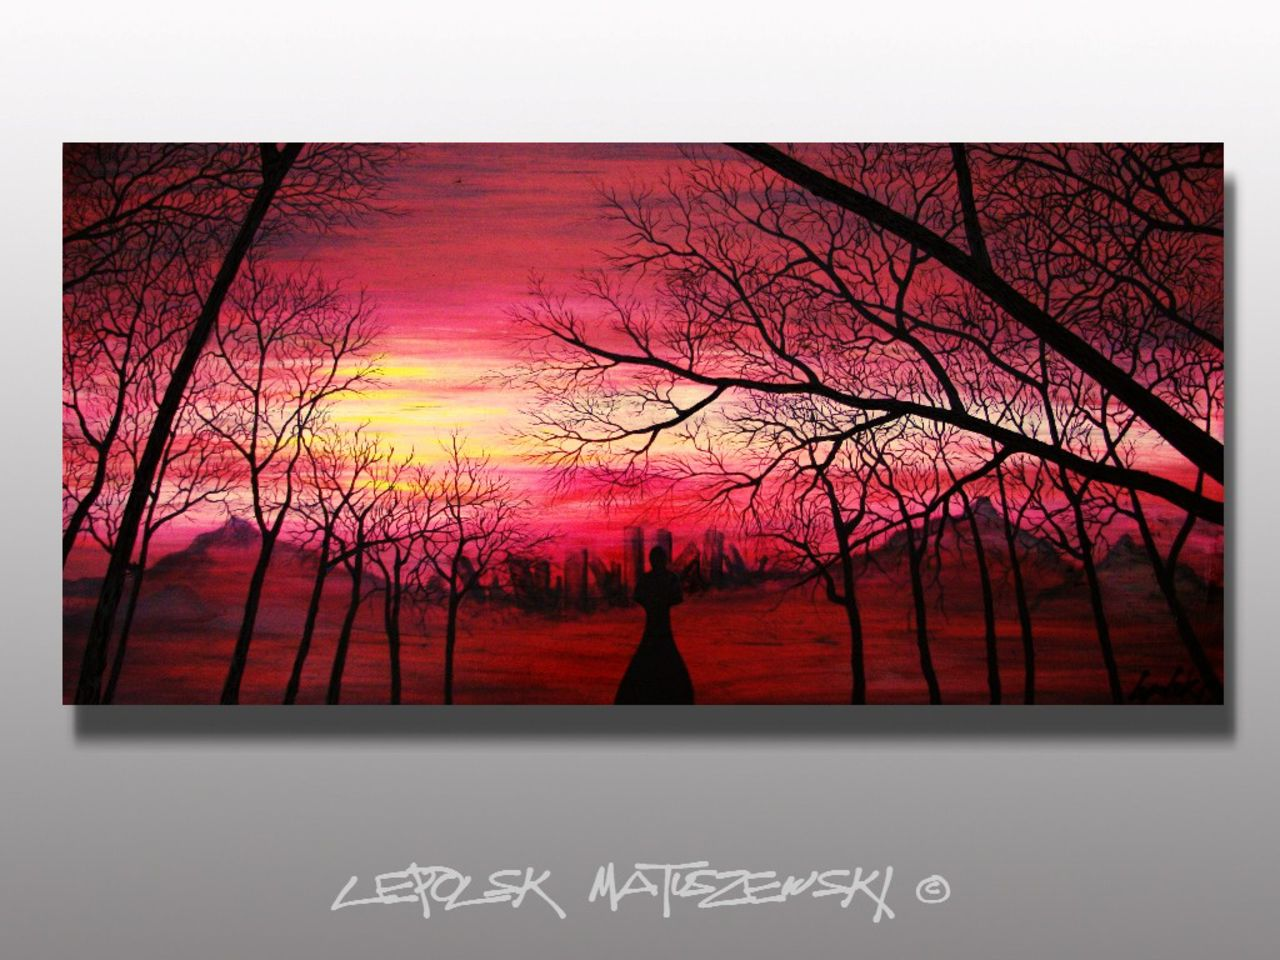 MISTER K  (Lepolsk Matuszewski) EXCITATORIA LUMINA    art innabstrait Lepolsk Matuszewski